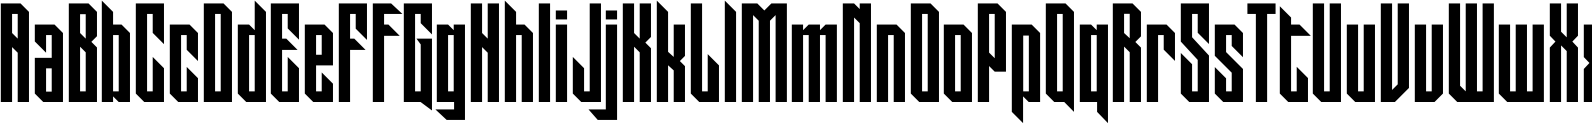 FXMachina